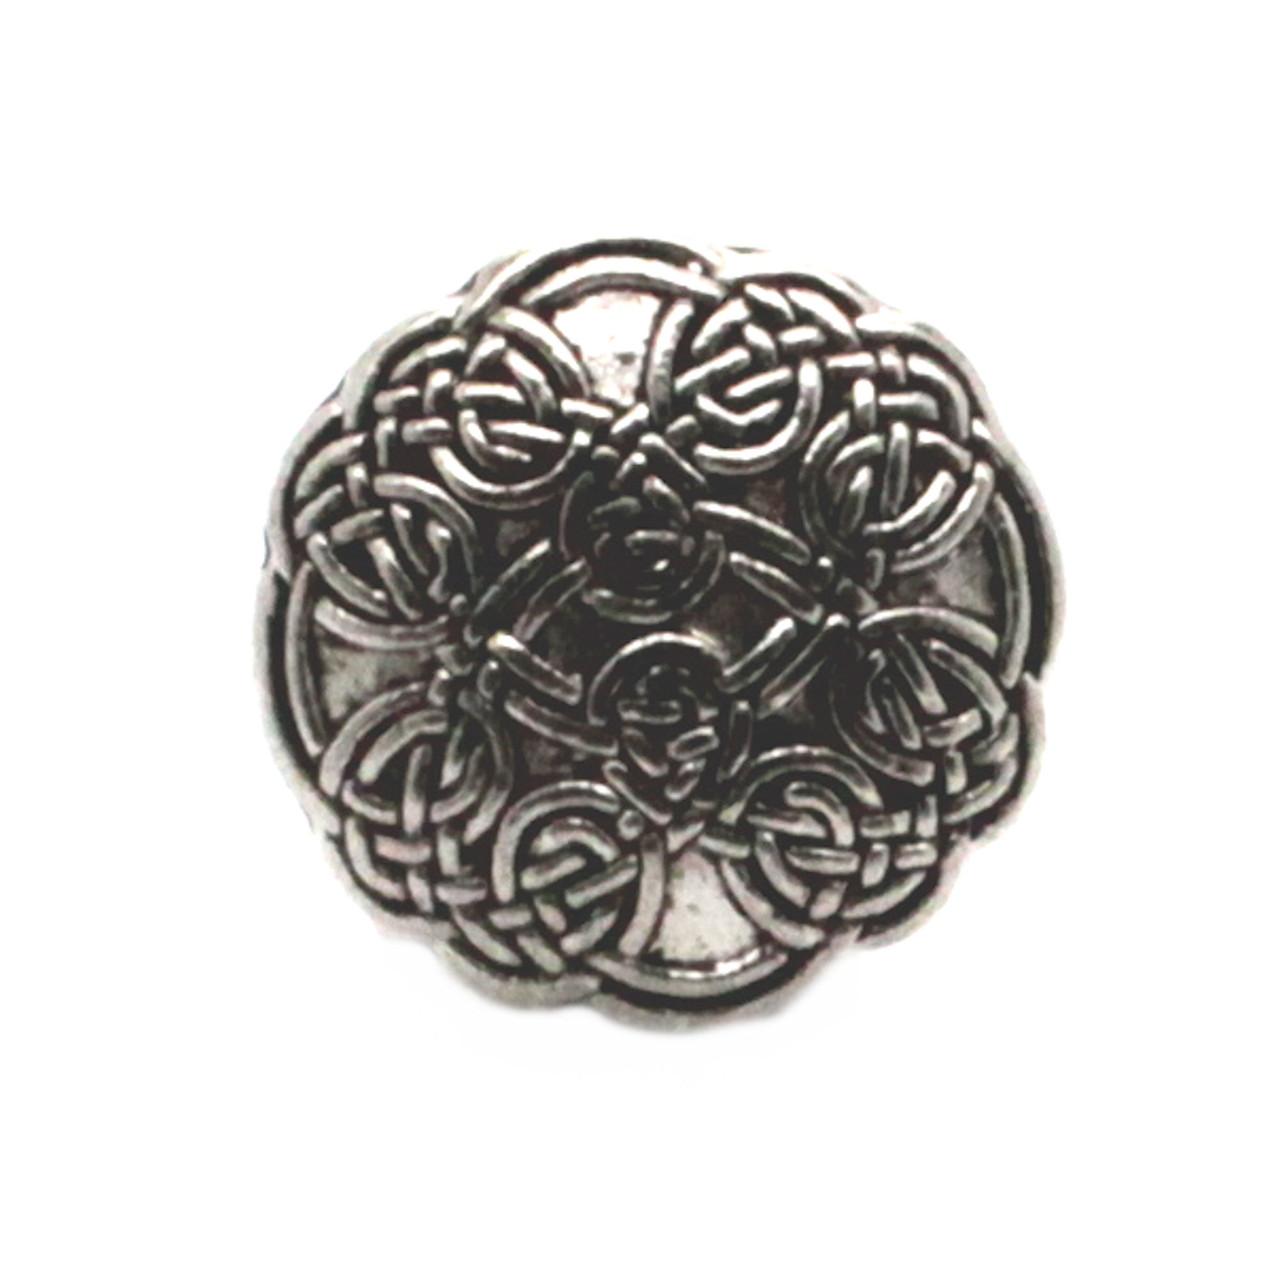 "Celtic Button Antique Nickel 7/8"" Front"